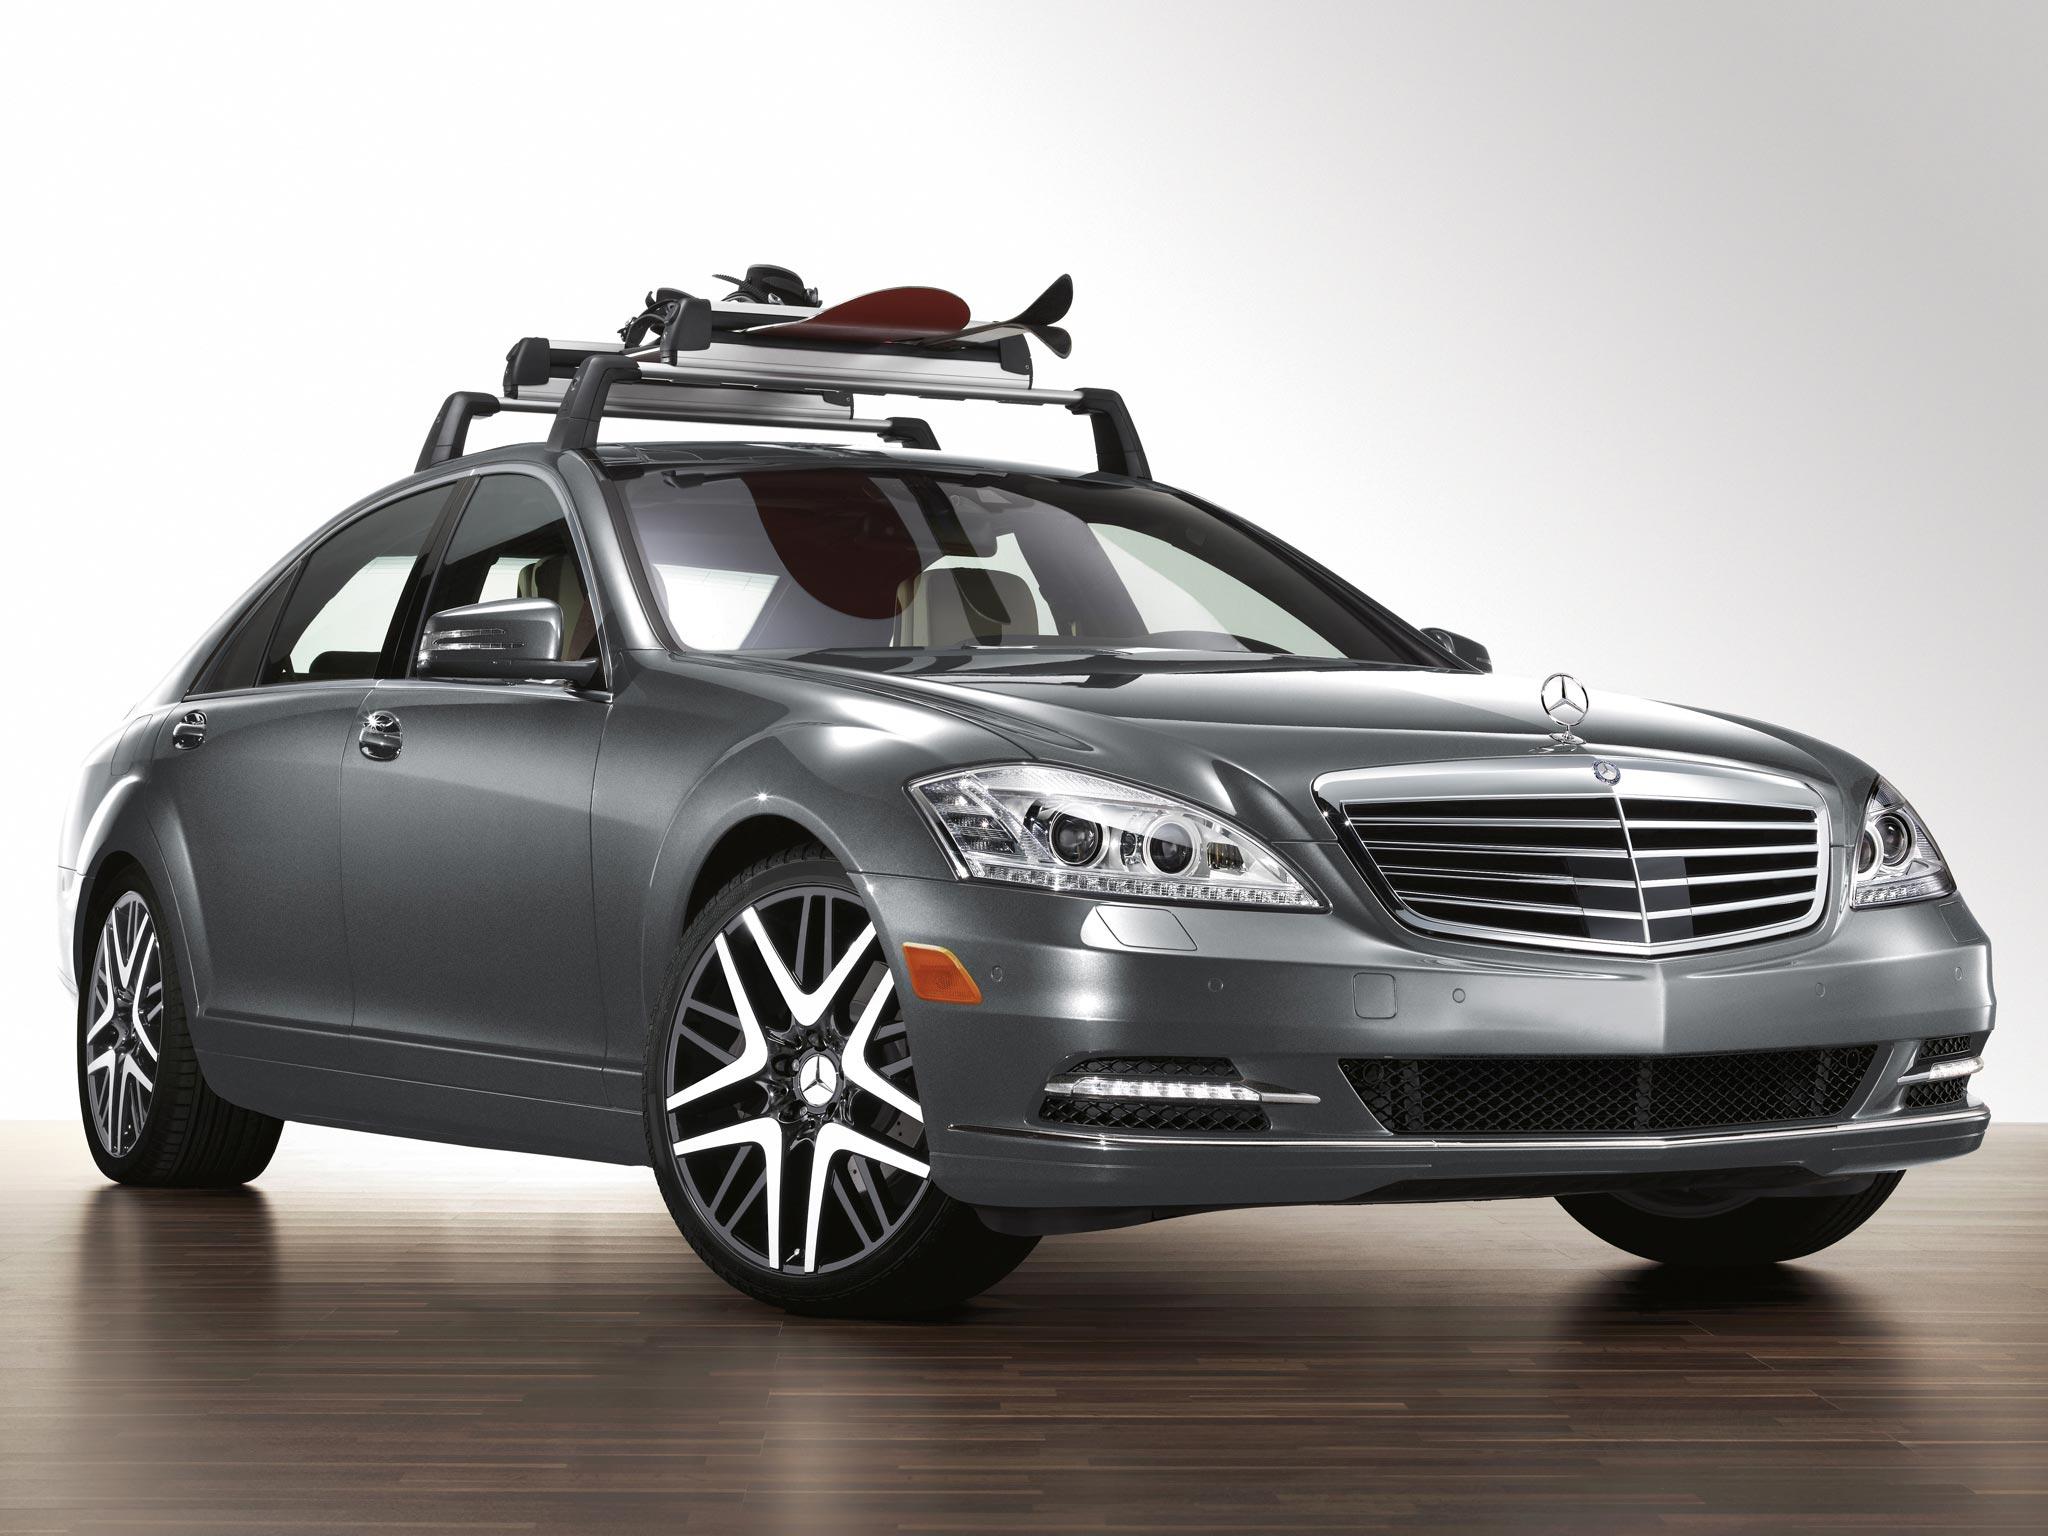 2013 Mercedes Benz S65 AMG Sedan – Review